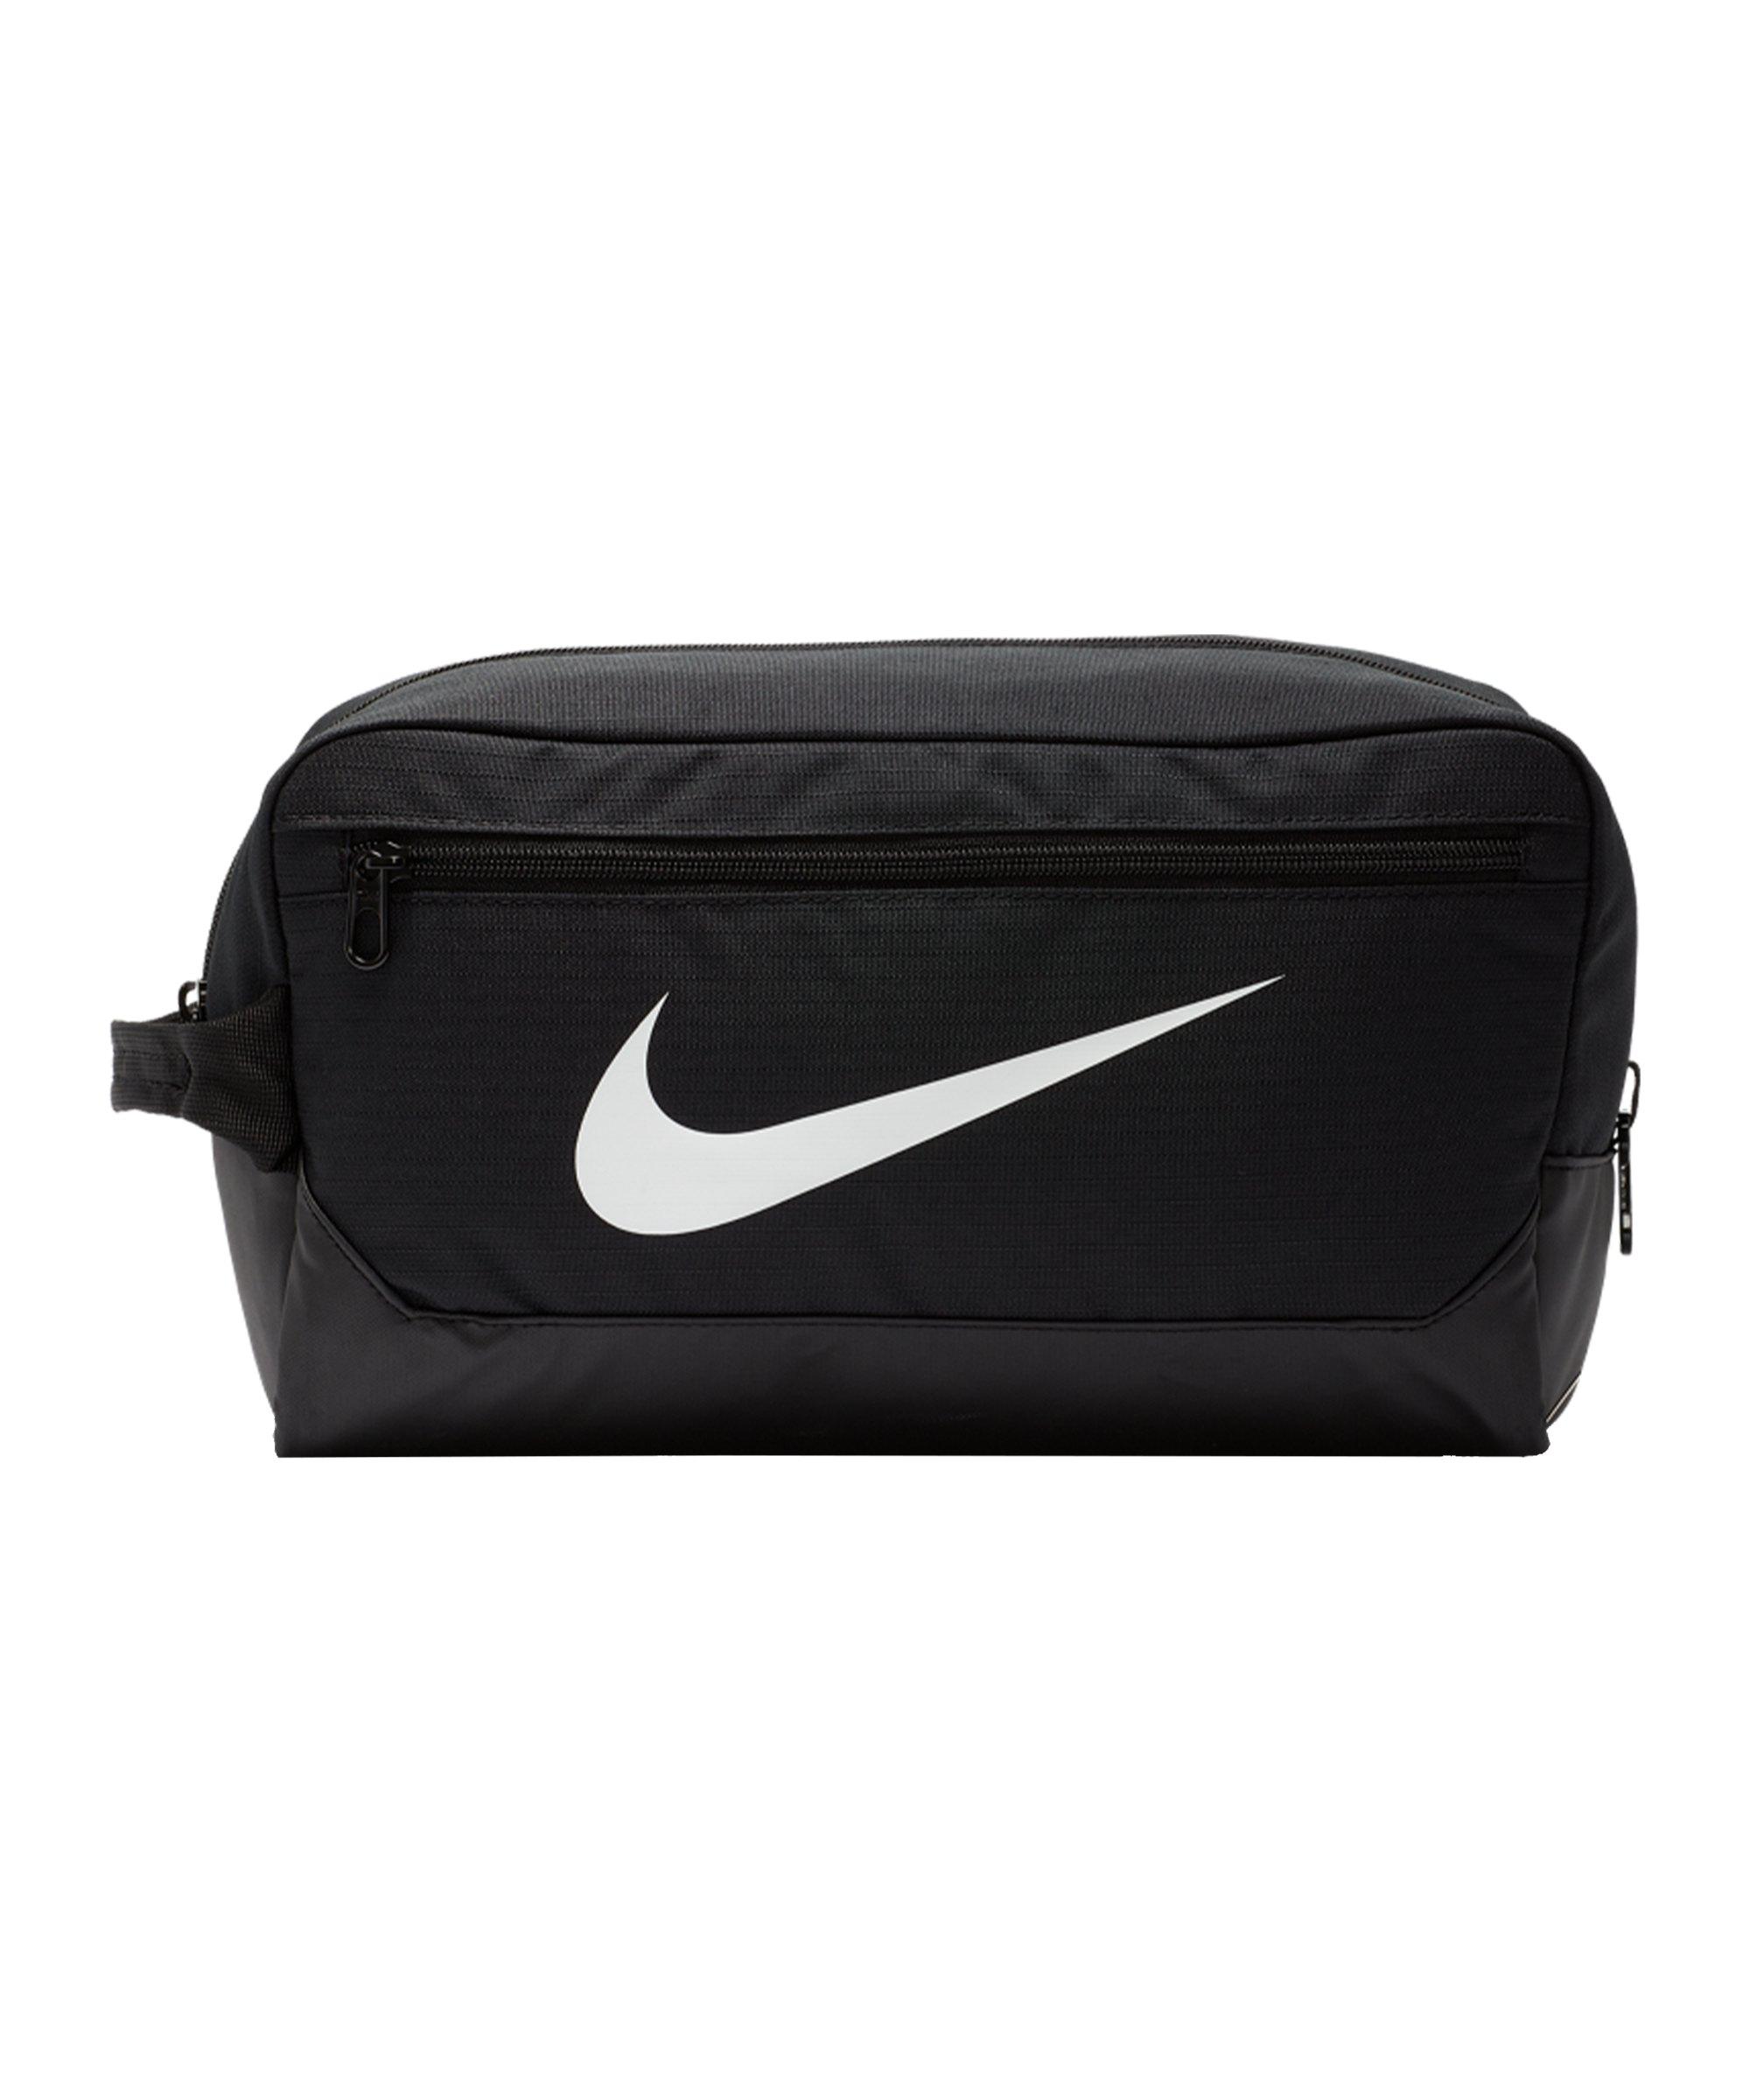 Nike Brasilia 9.0 Shoebag Schwarz F010 - schwarz